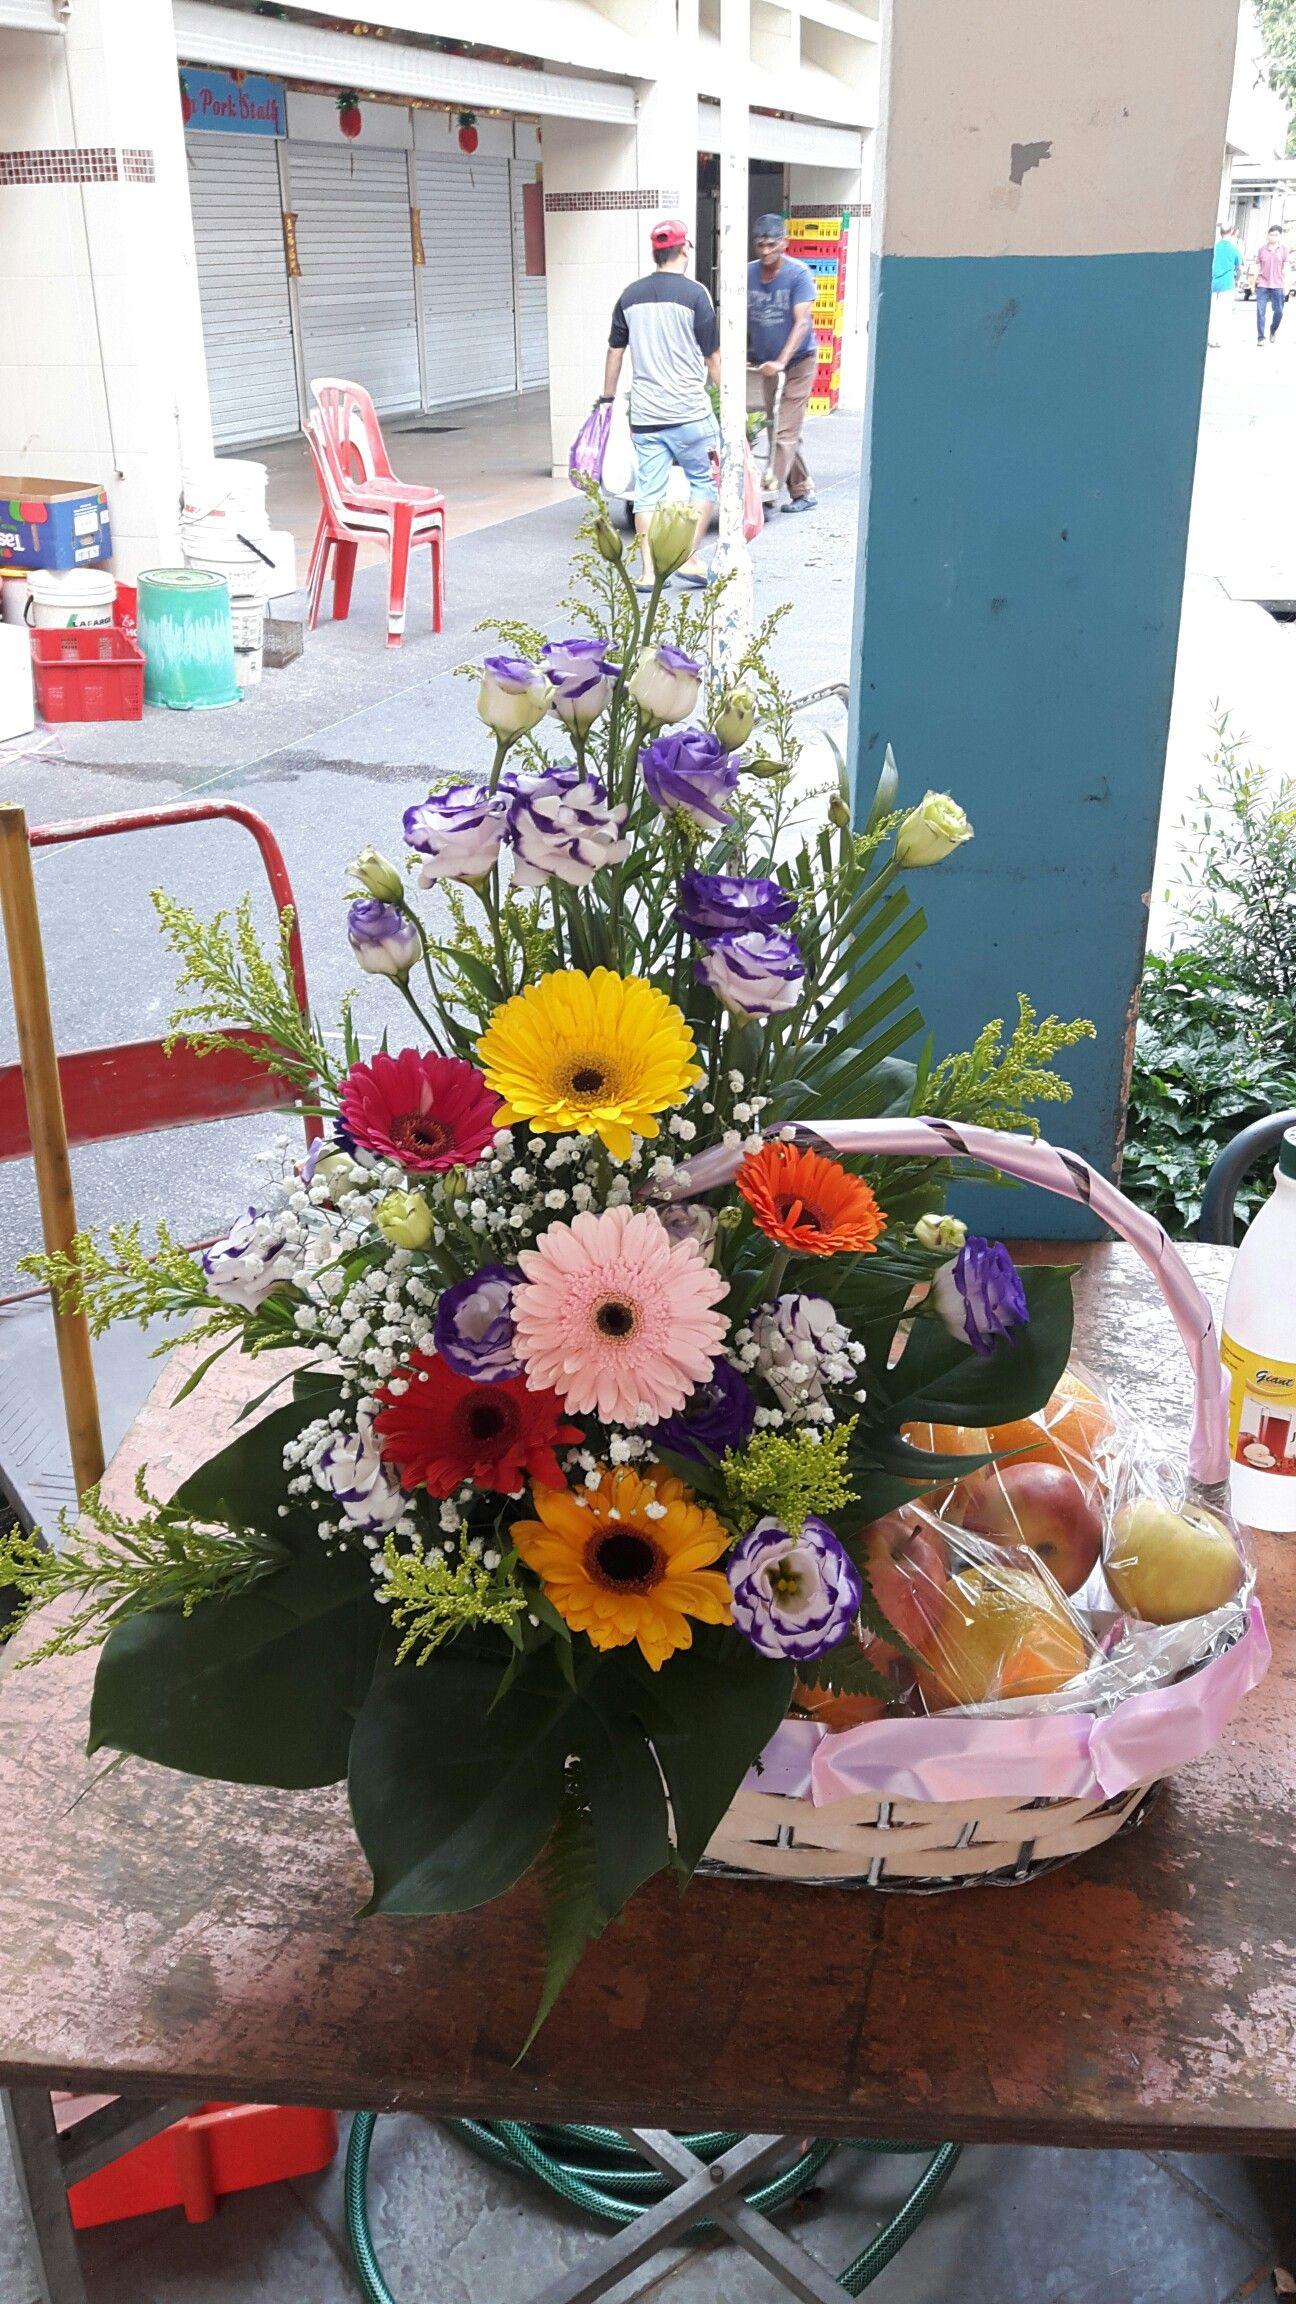 60 fruit flower basket gerberas and eustomas flower baskets 60 fruit flower basket gerberas and eustomas izmirmasajfo